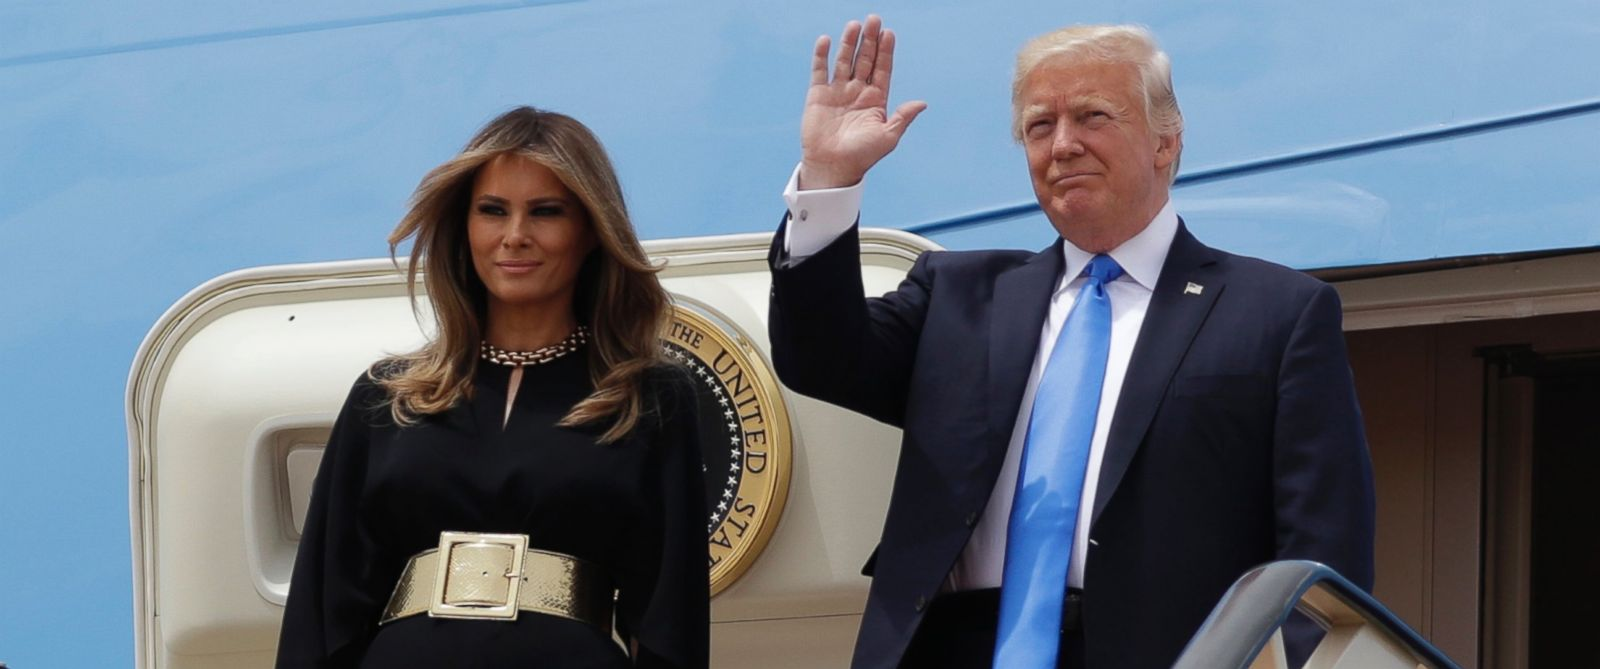 PHOTO: U.S. President Donald Trump, right, and first lady Melania Trump arrive at the Royal Terminal of King Khalid International Airport, Saturday, May 20, 2017, in Riyadh.